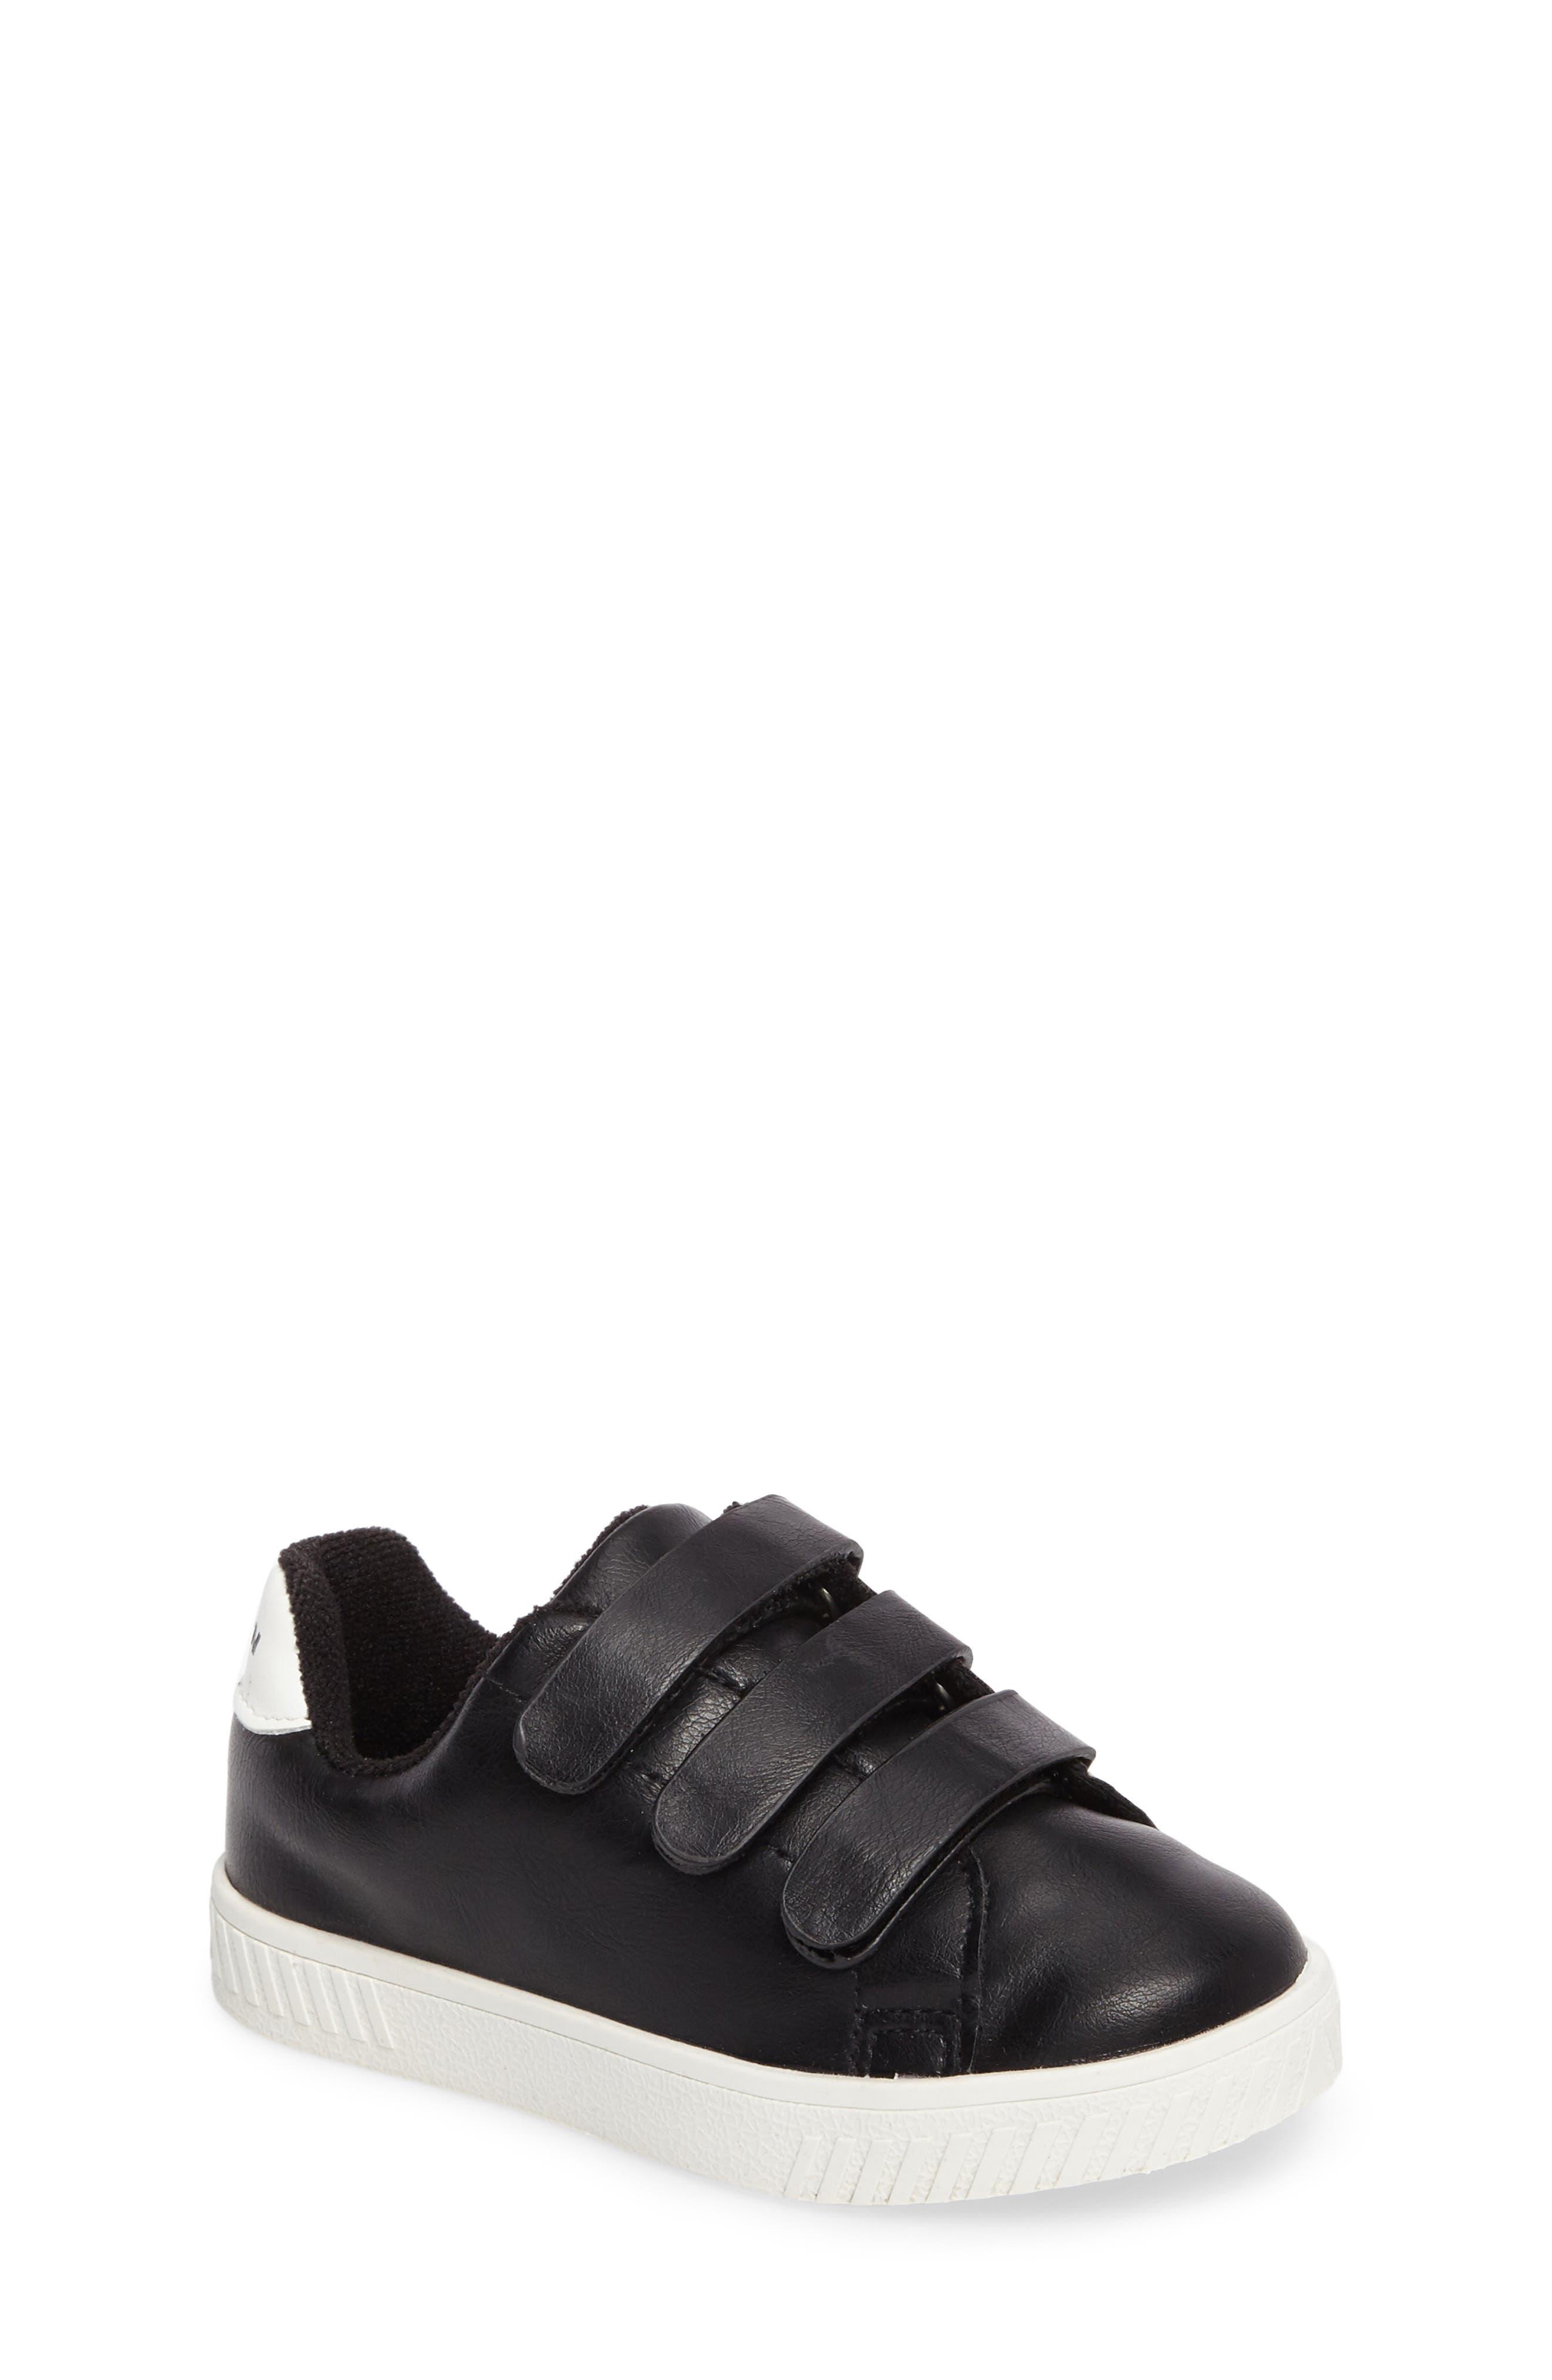 Camden Carry Sneaker,                         Main,                         color, Black Vintage White